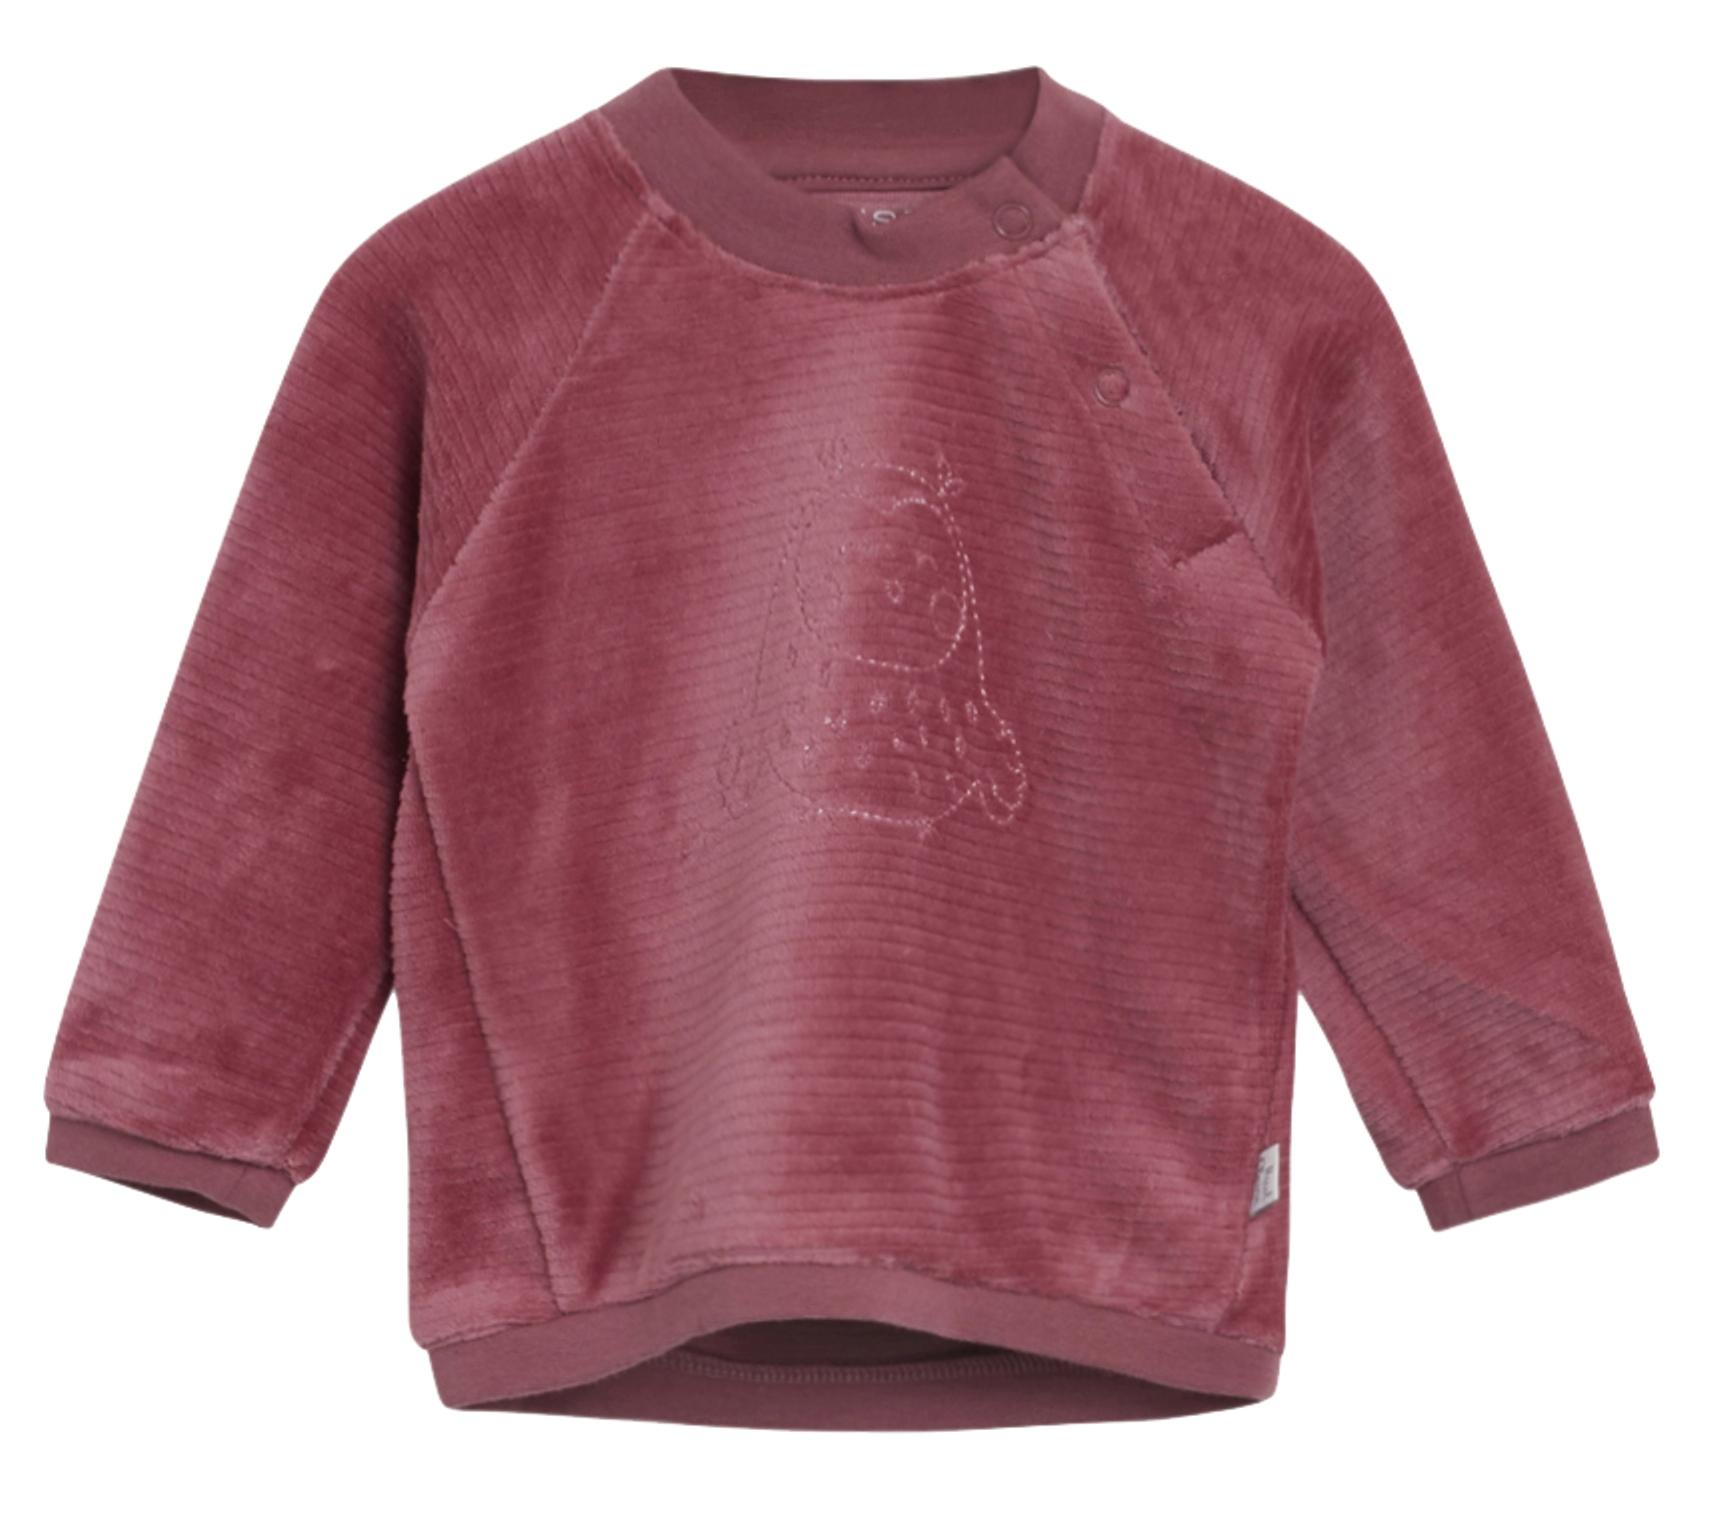 Hust & Claire Baby Sweatshirt Silva Red Rouge